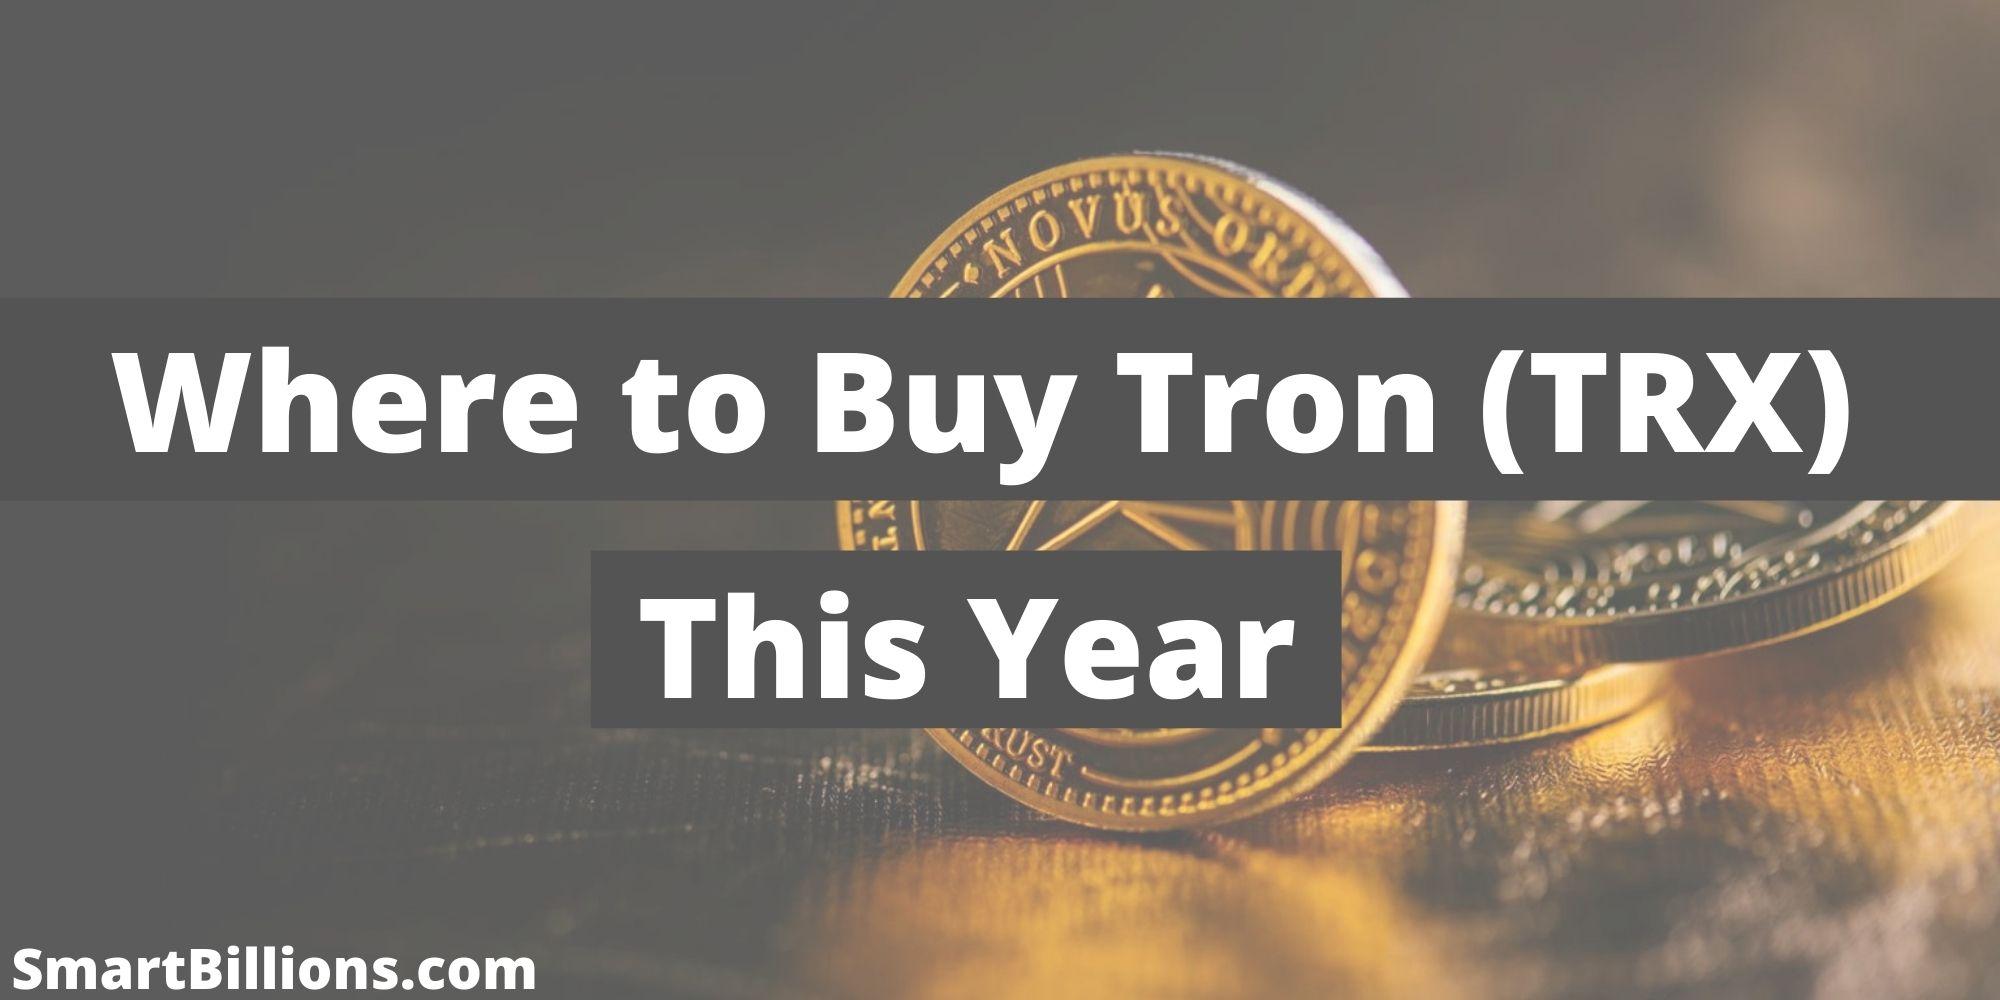 where to buy tron (trx)